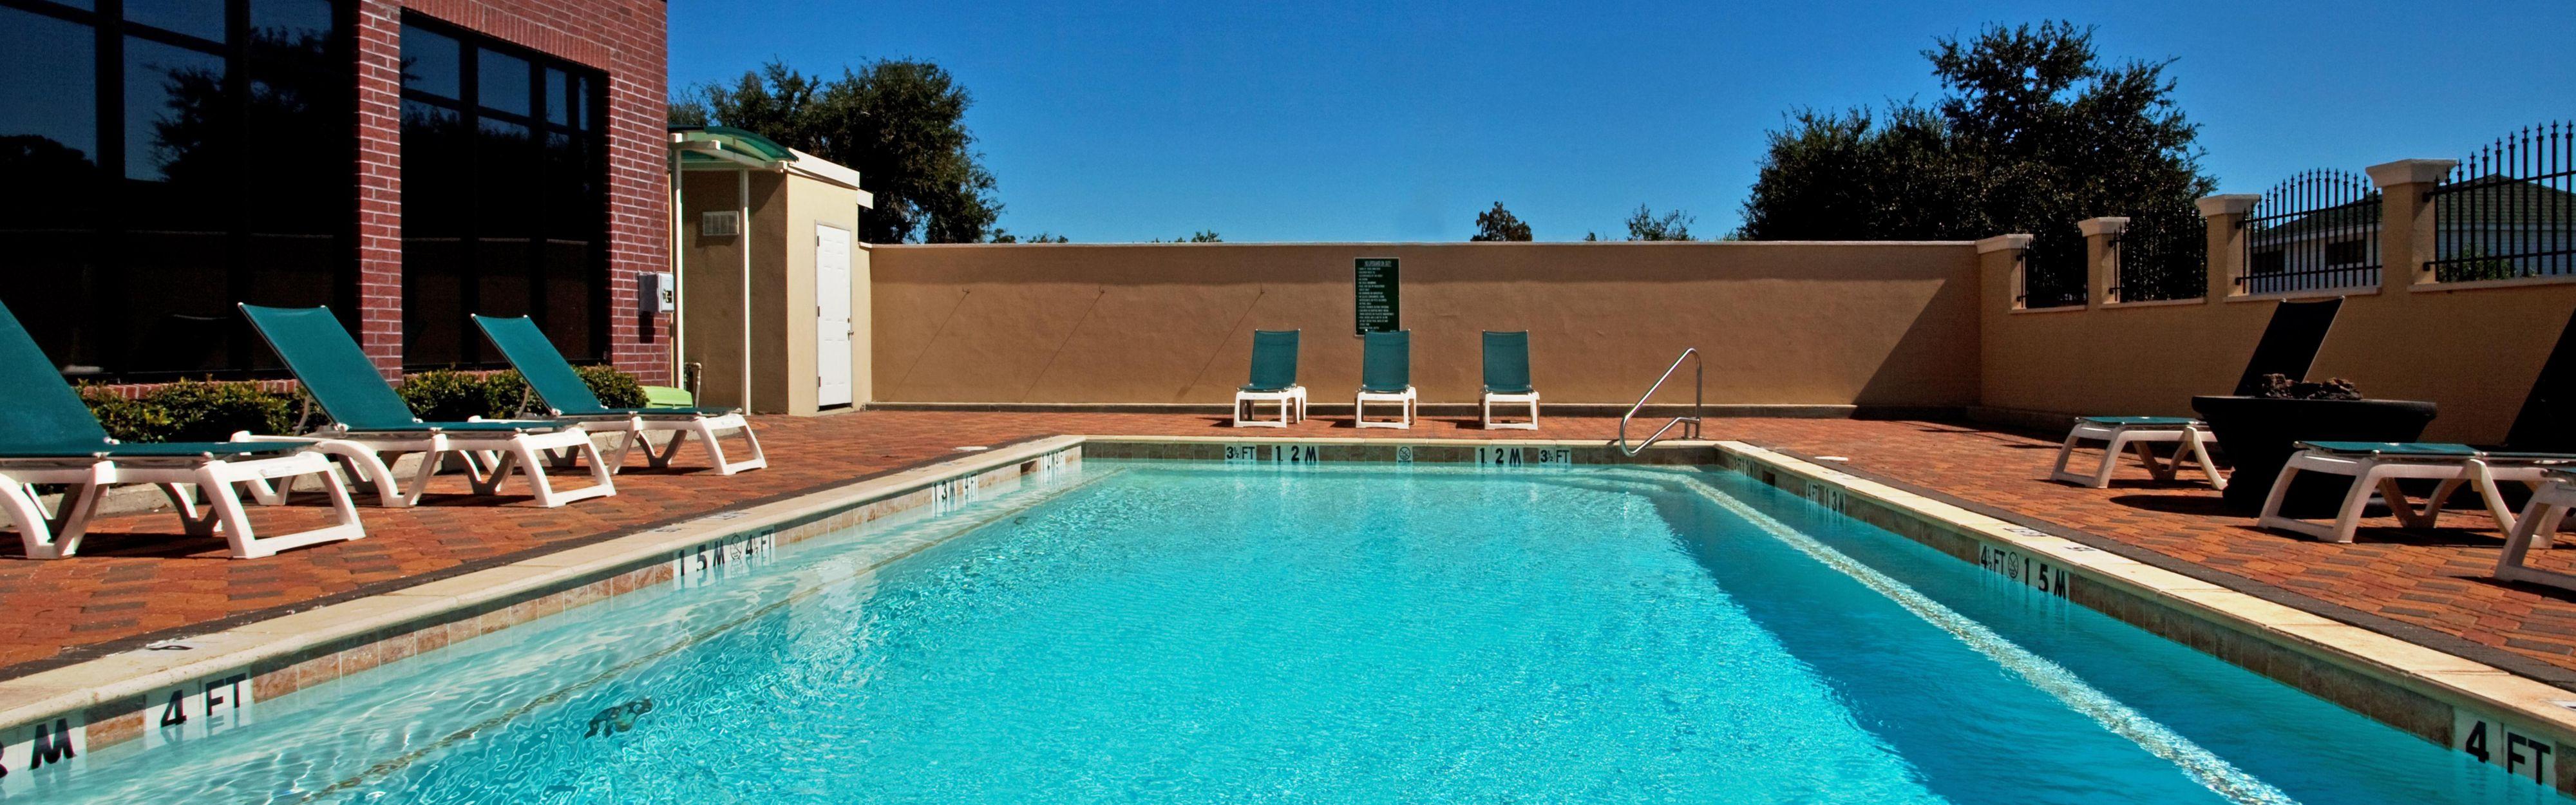 Holiday inn houma houma louisiana la - Regis college swimming pool hours ...